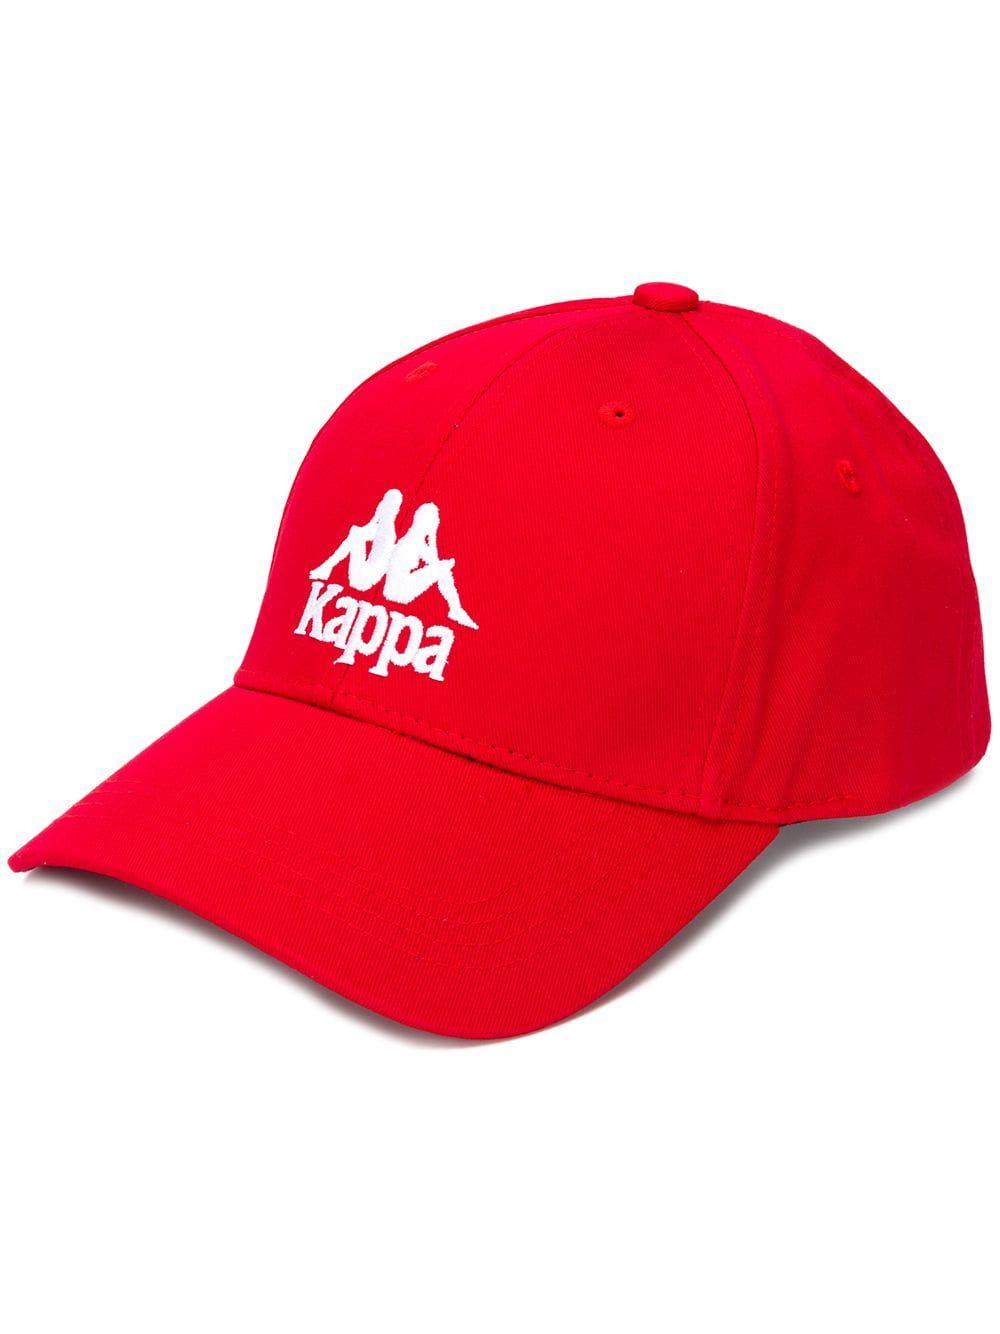 7487fc2e KAPPA KAPPA EMBROIDERED LOGO BASEBALL CAP. #kappa | Kappa in 2019 ...